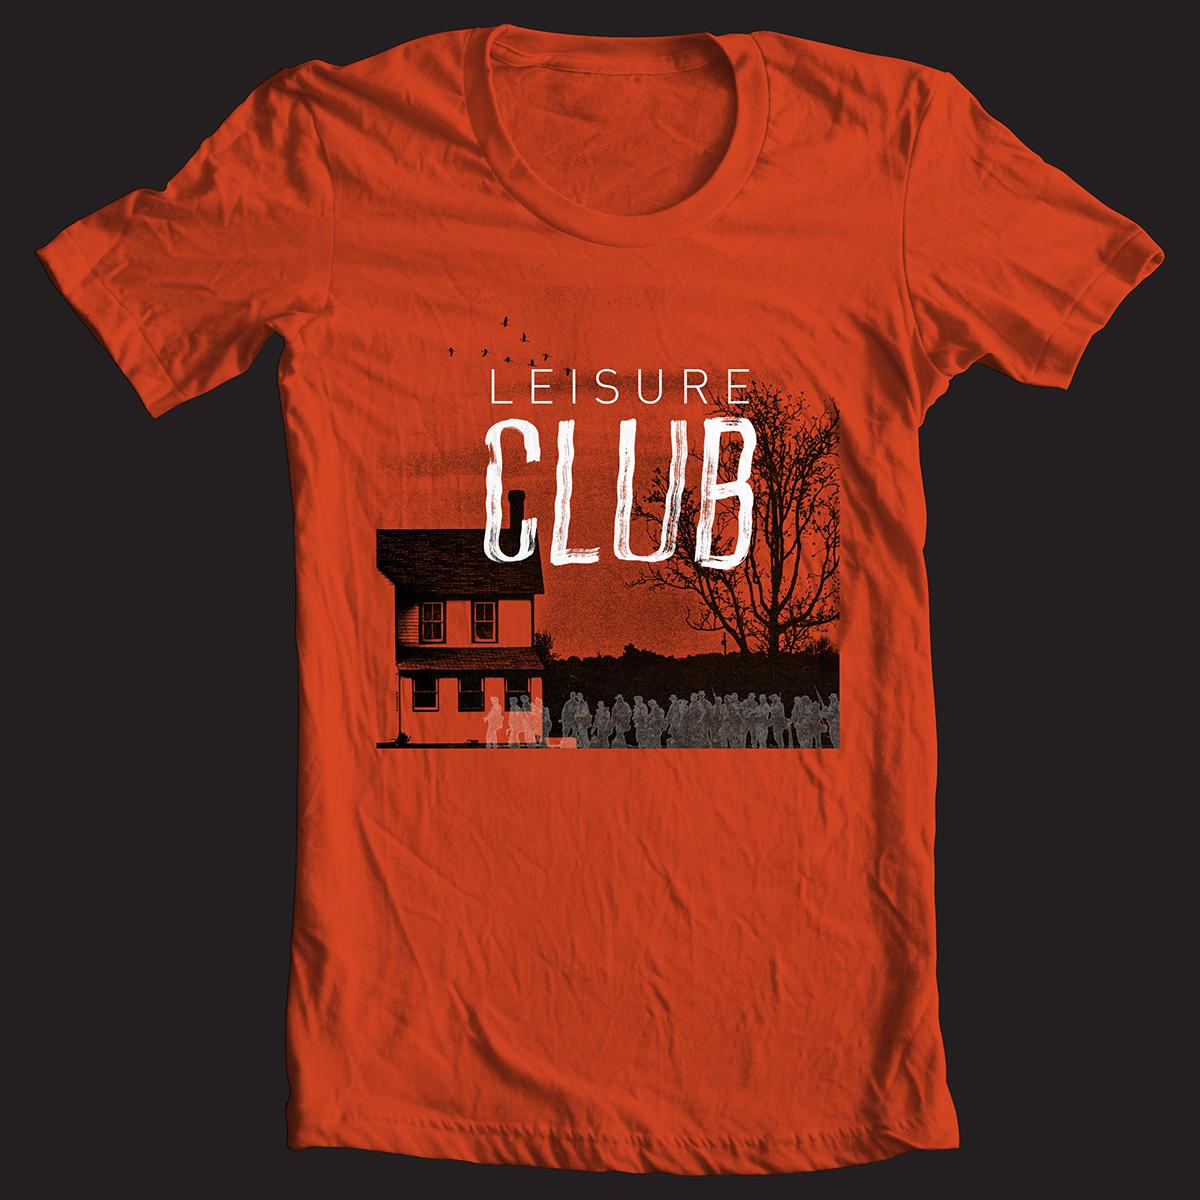 shirt_leisureclub.jpg